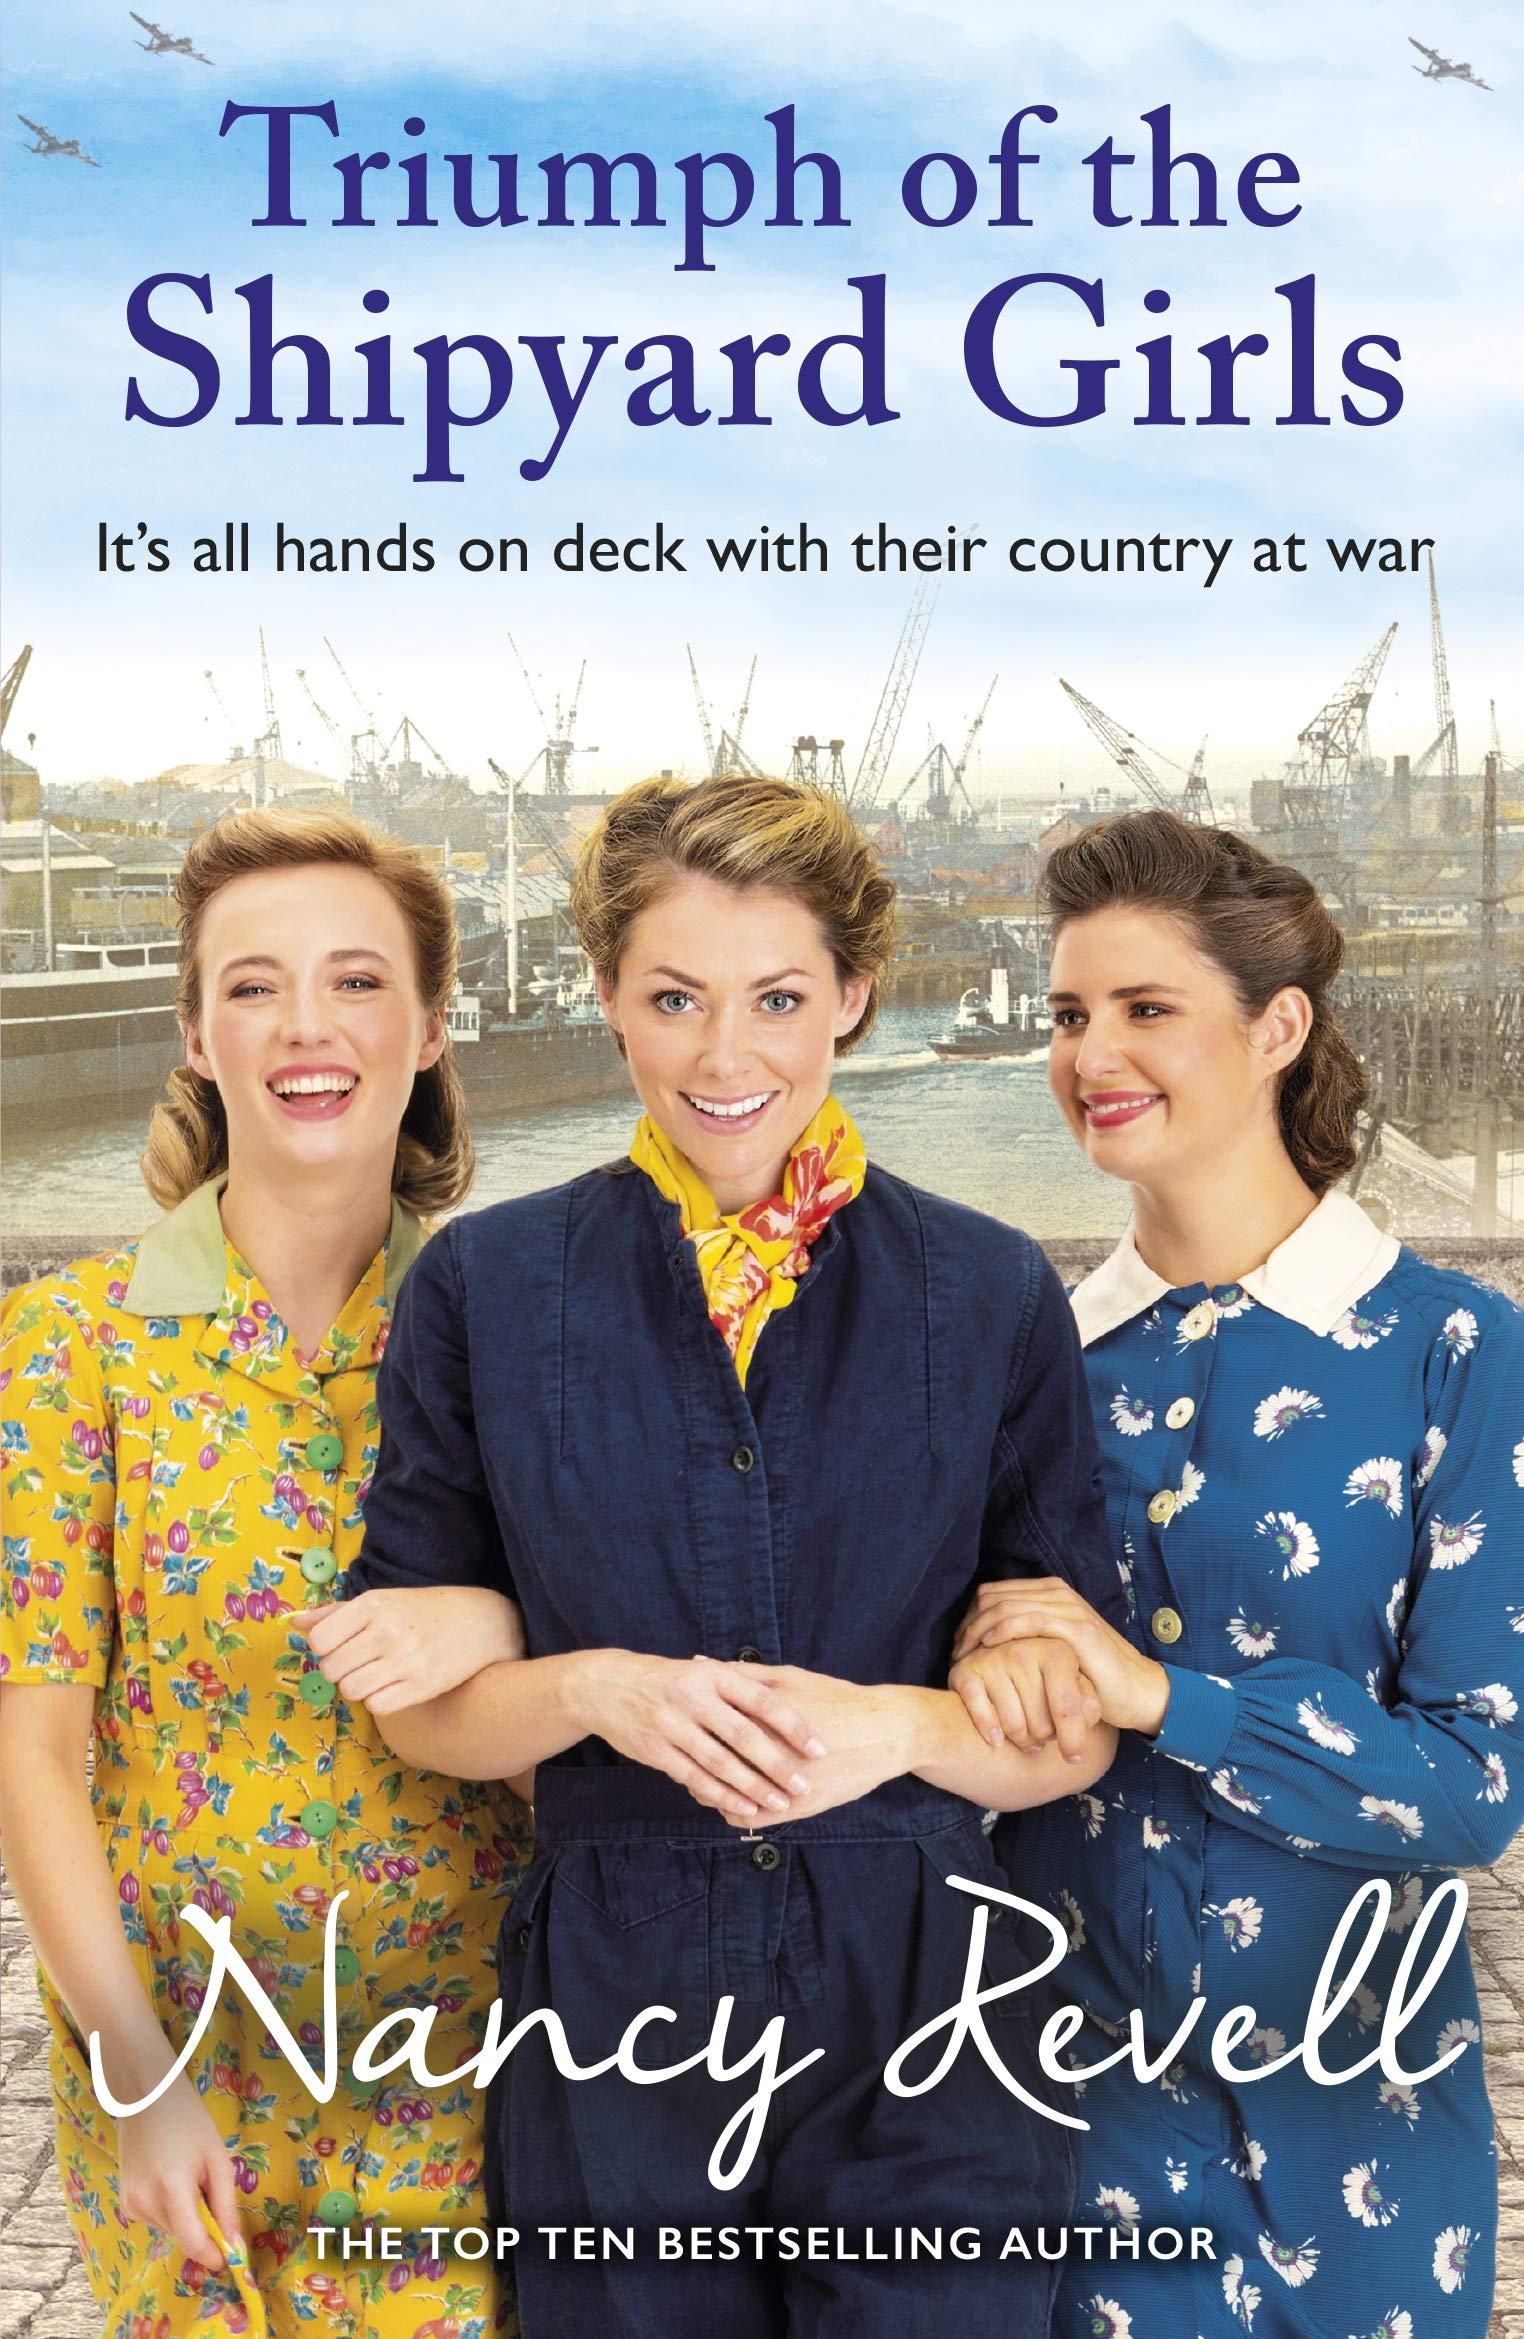 Triumph of the Shipyard Girls: 8 (The Shipyard Girls Series): Amazon.co.uk:  Revell, Nancy: 9781787464261: Books